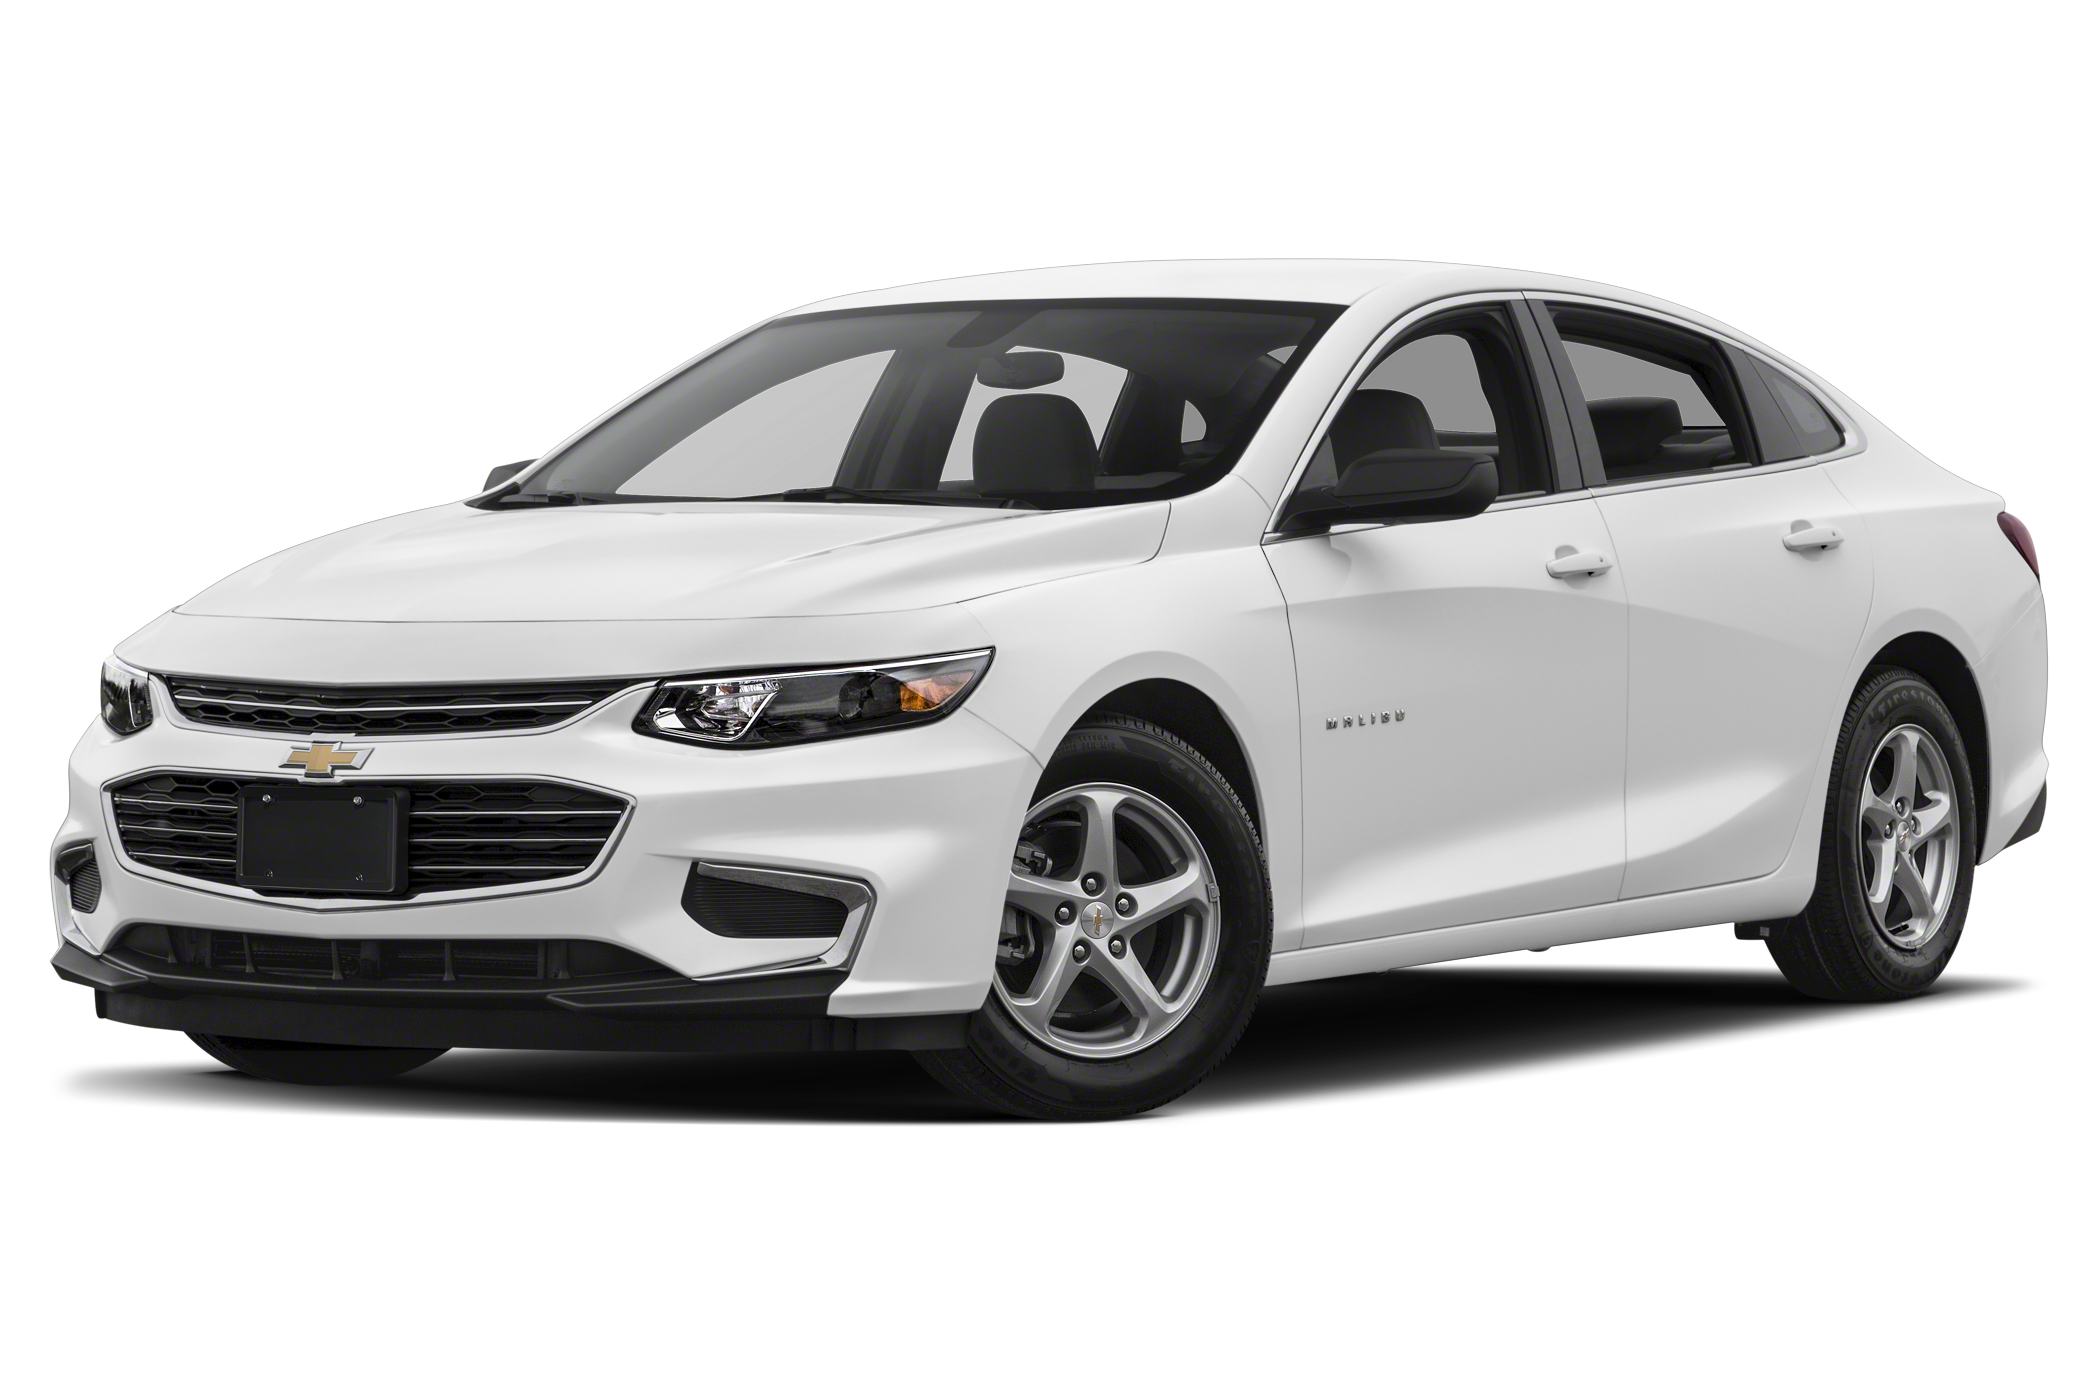 pare Chevrolet Malibu to Chevrolet Impala